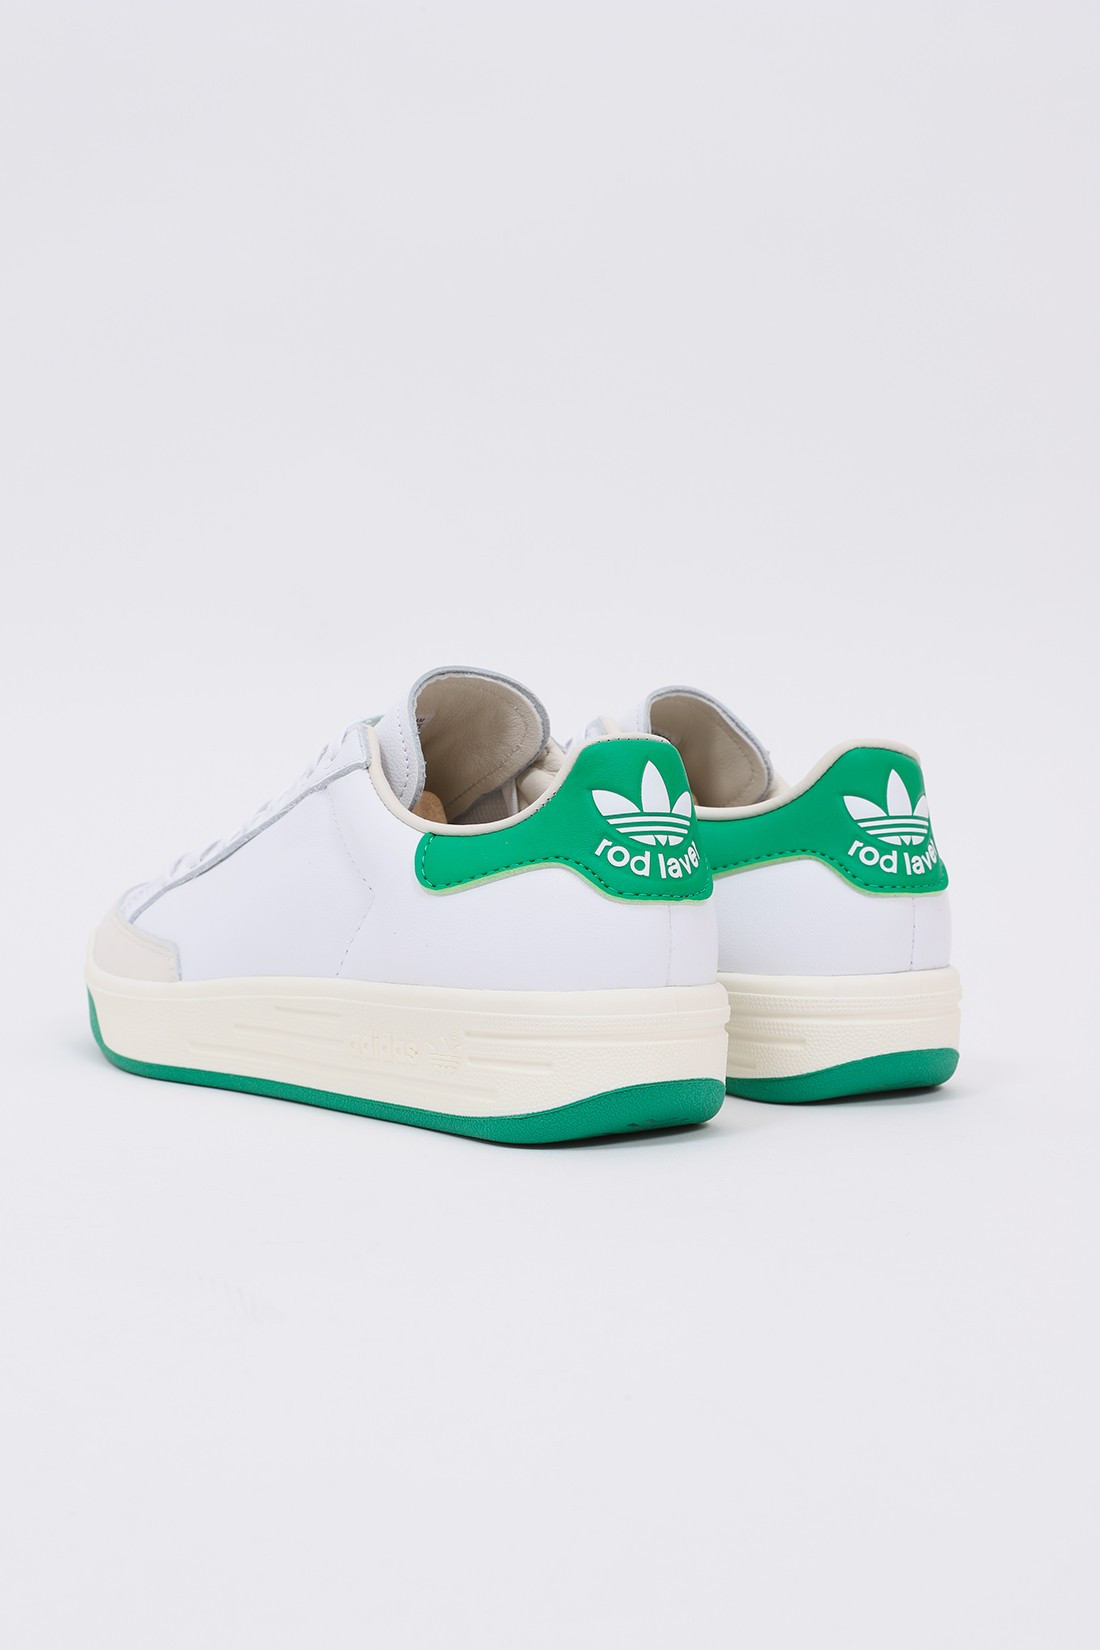 ADIDAS / Rod laver Green